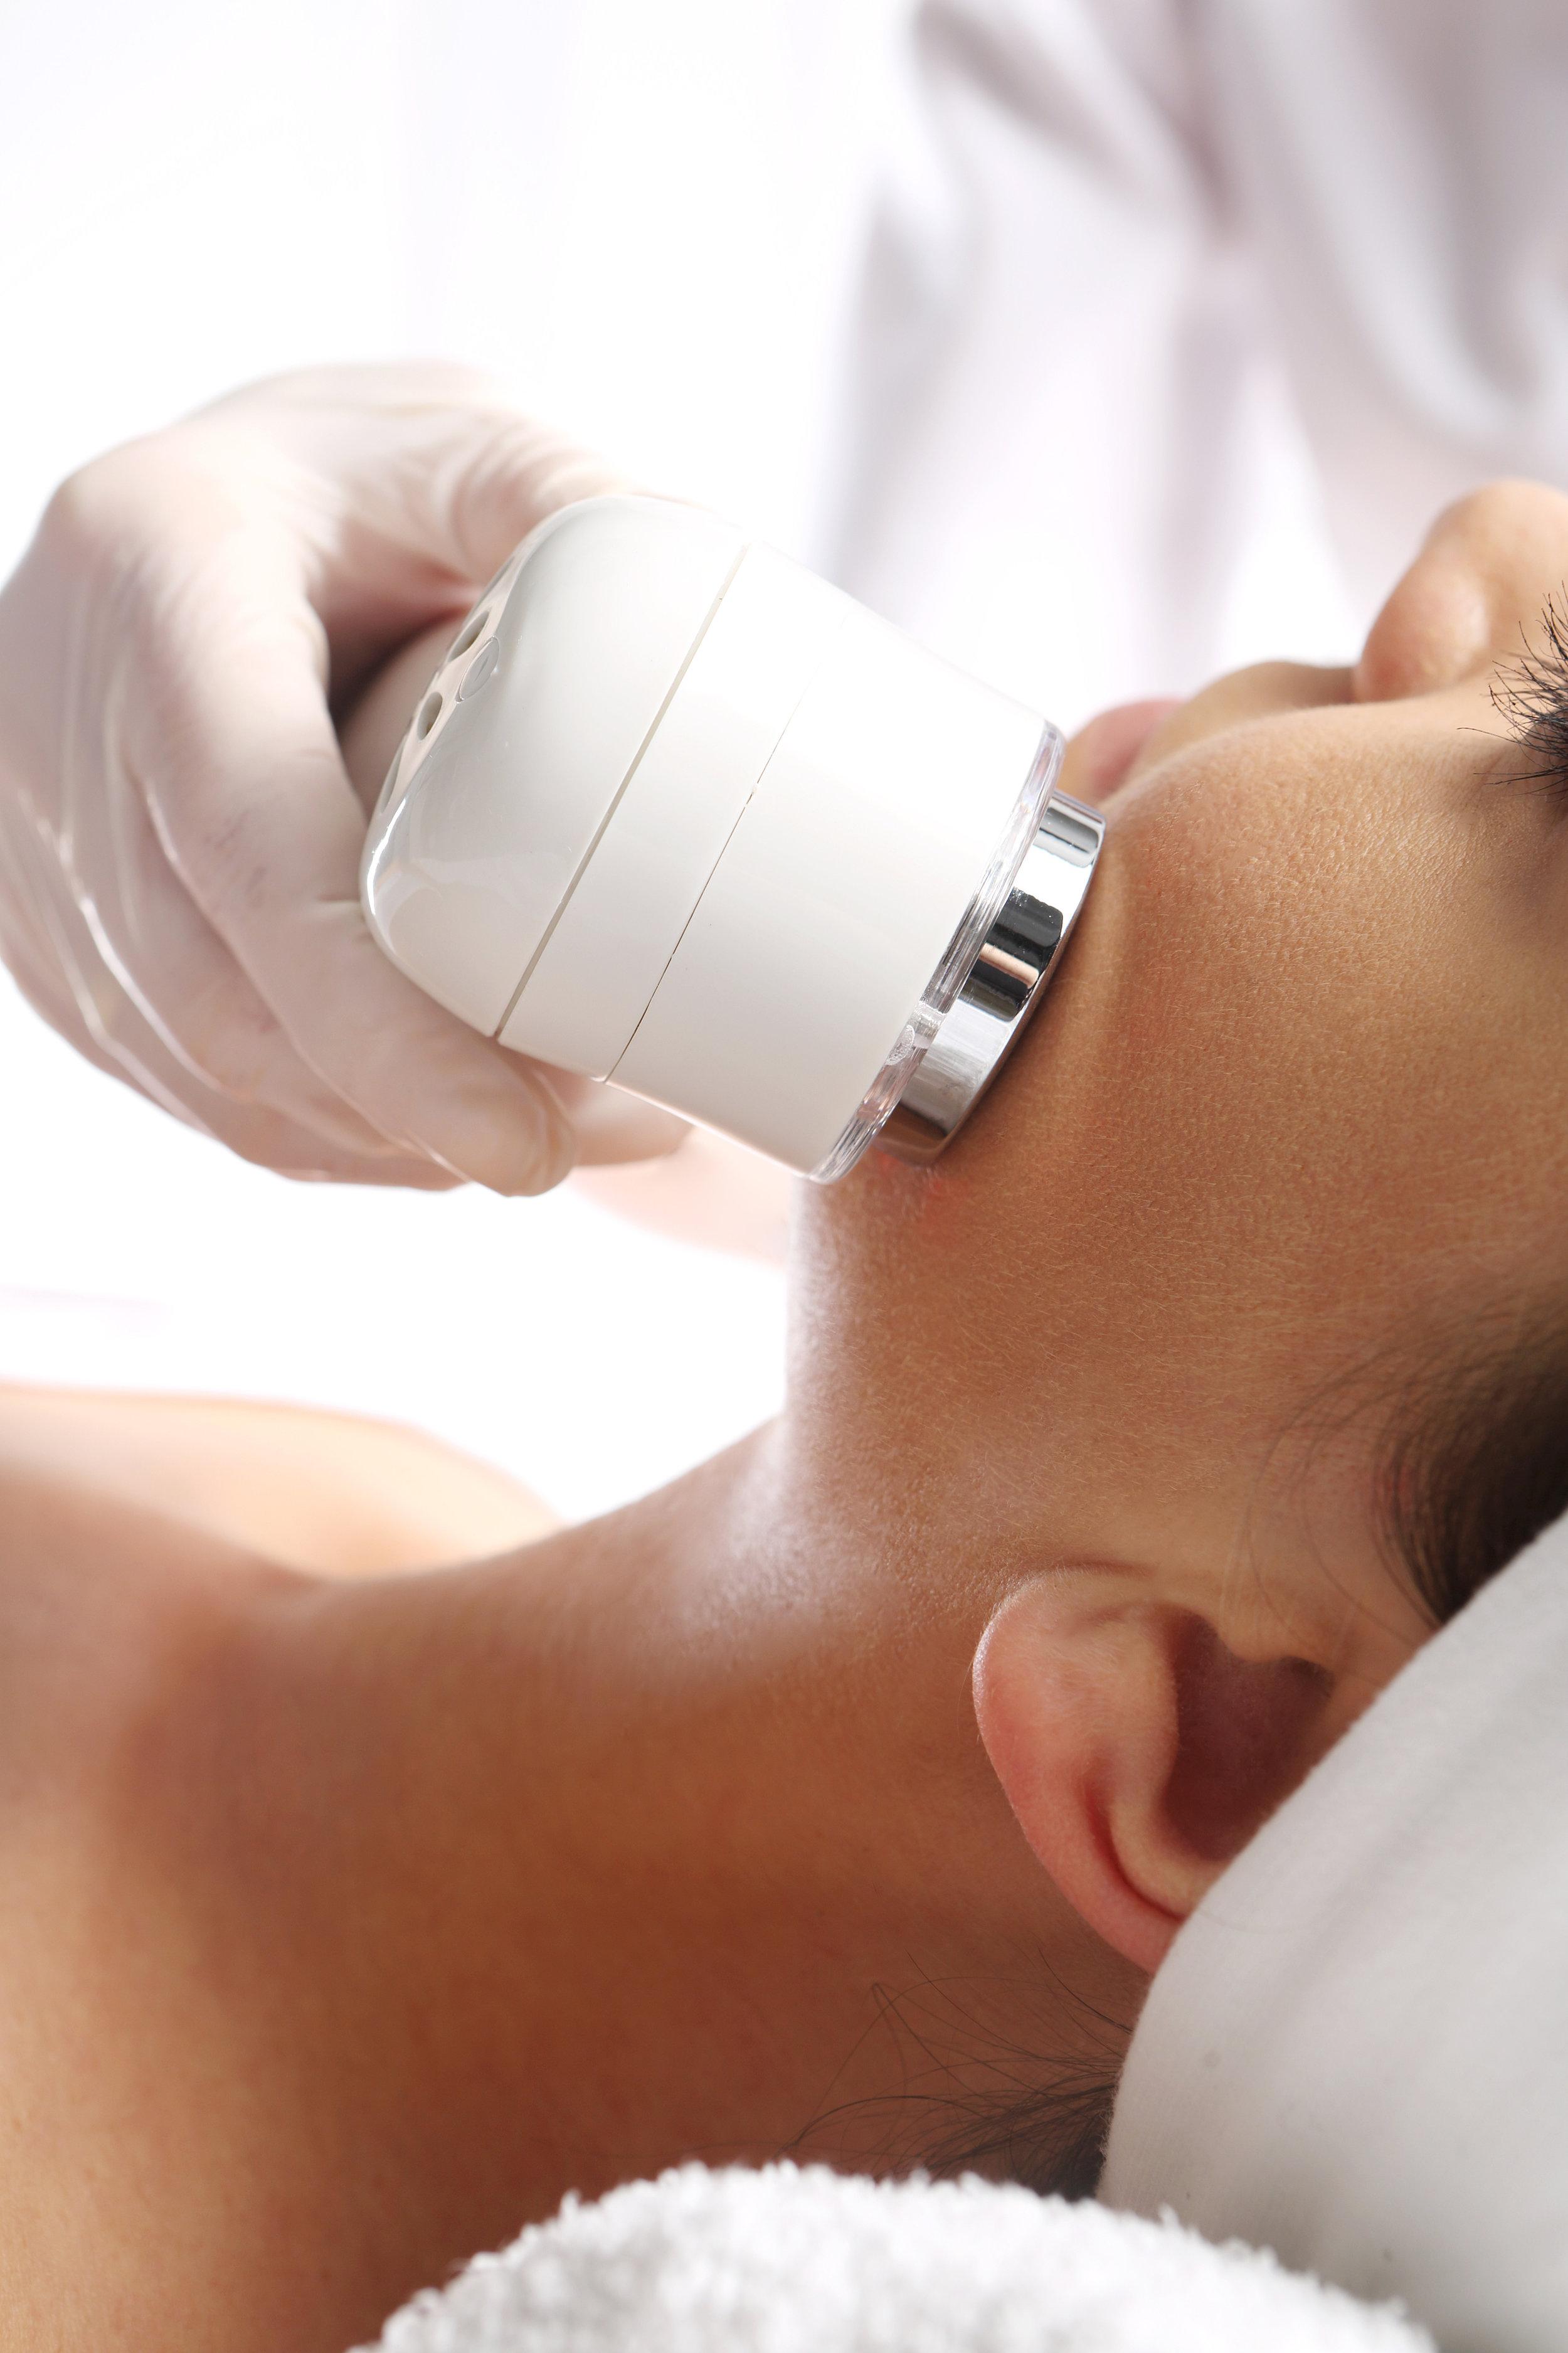 Photon Ultrasound LED Light Therapy